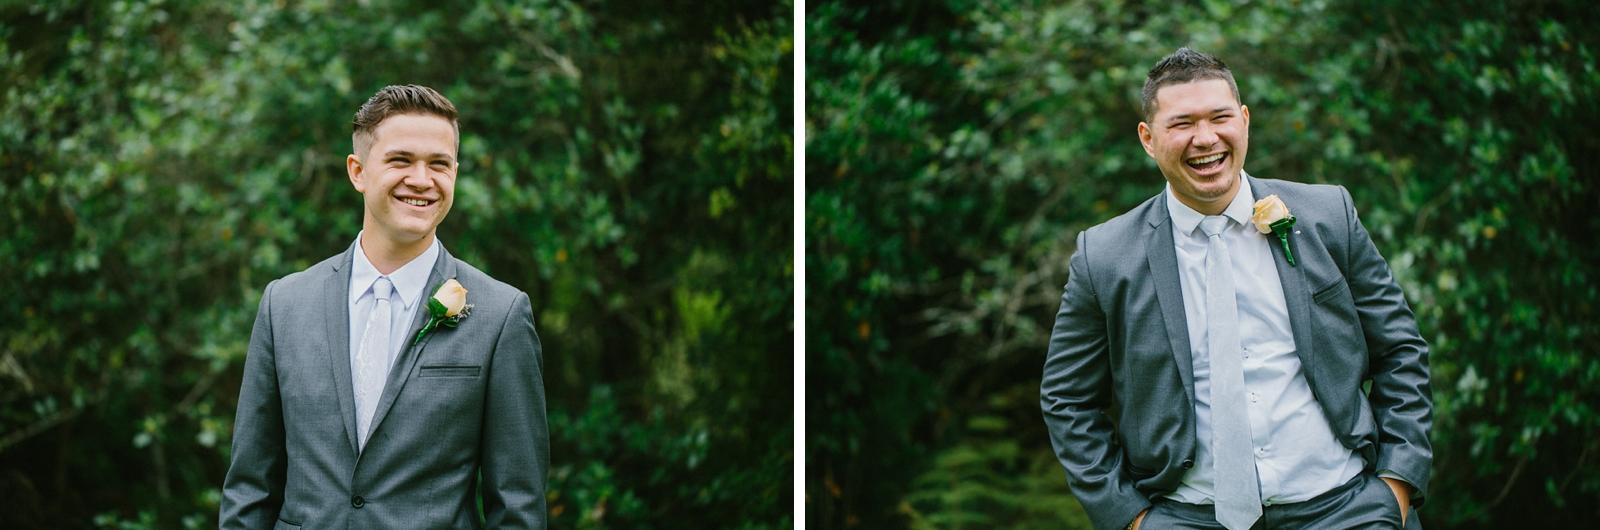 GabbyFiti_Auckland Wedding Photographer_Patty Lagera_0052.jpg